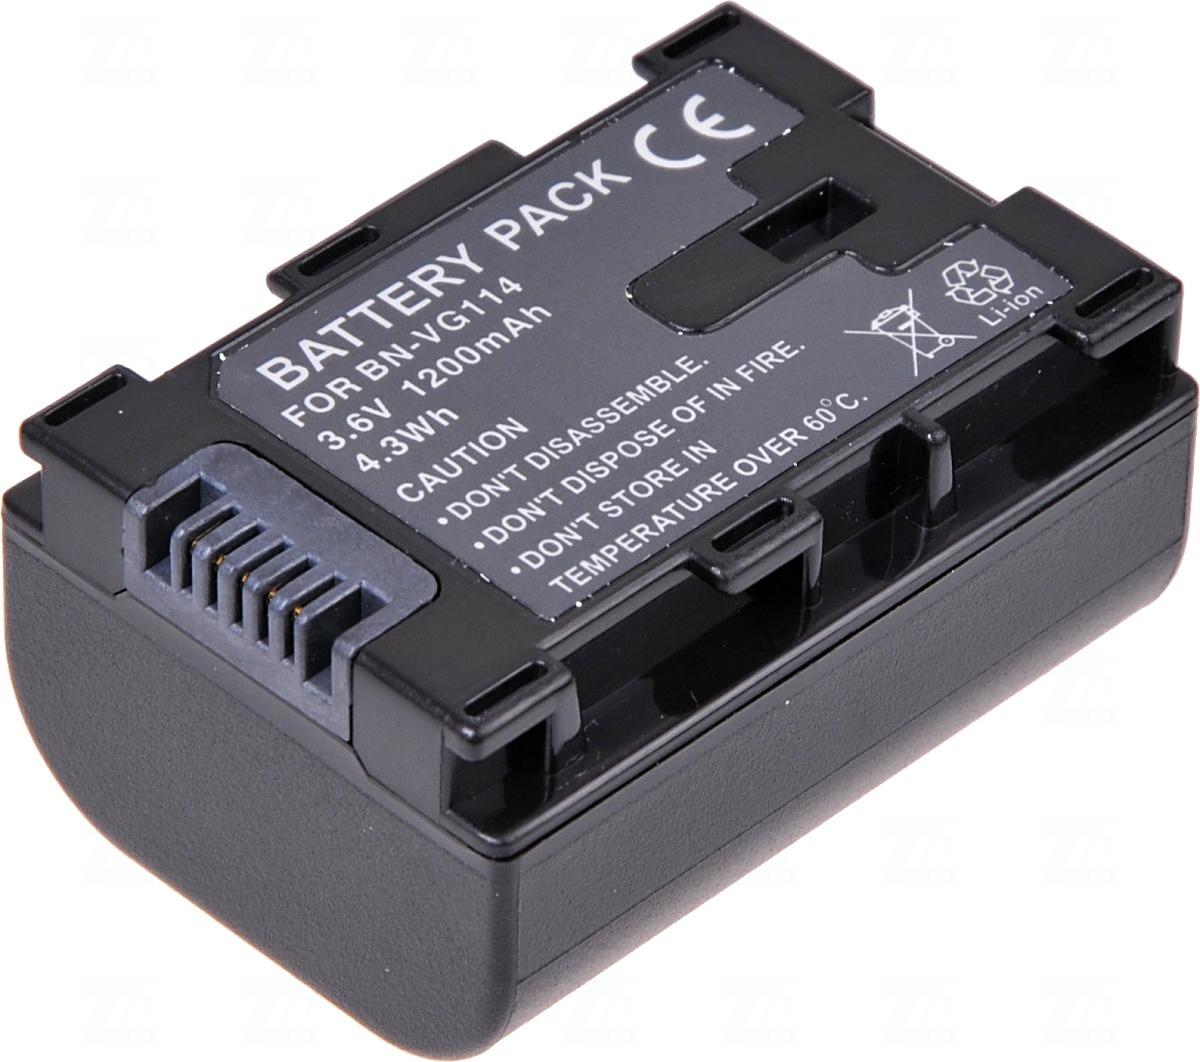 Baterie T6 power BN-VG107, BN-VG114, BN-VG107E, BN-VG107U, BN-VG114E, BN-VG114U, BN-VG108E, BN-VG108U